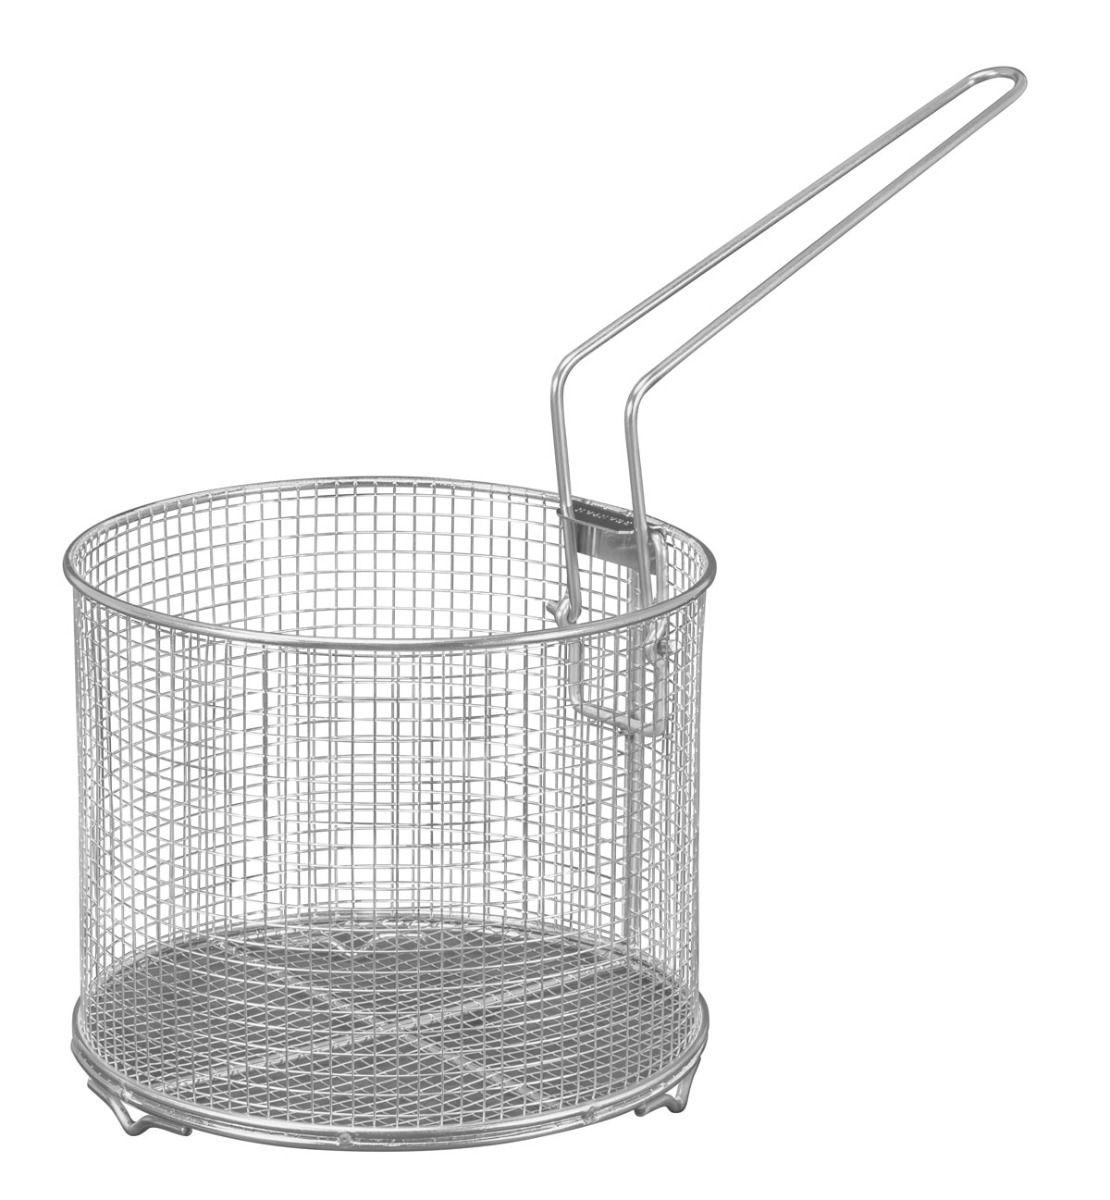 Онлайн каталог PROMENU: Сетка для фри из нержавеющей стали Scanpan TECHN IQ, диаметр 21 см, серебристый                                                  Scanpan 54300300